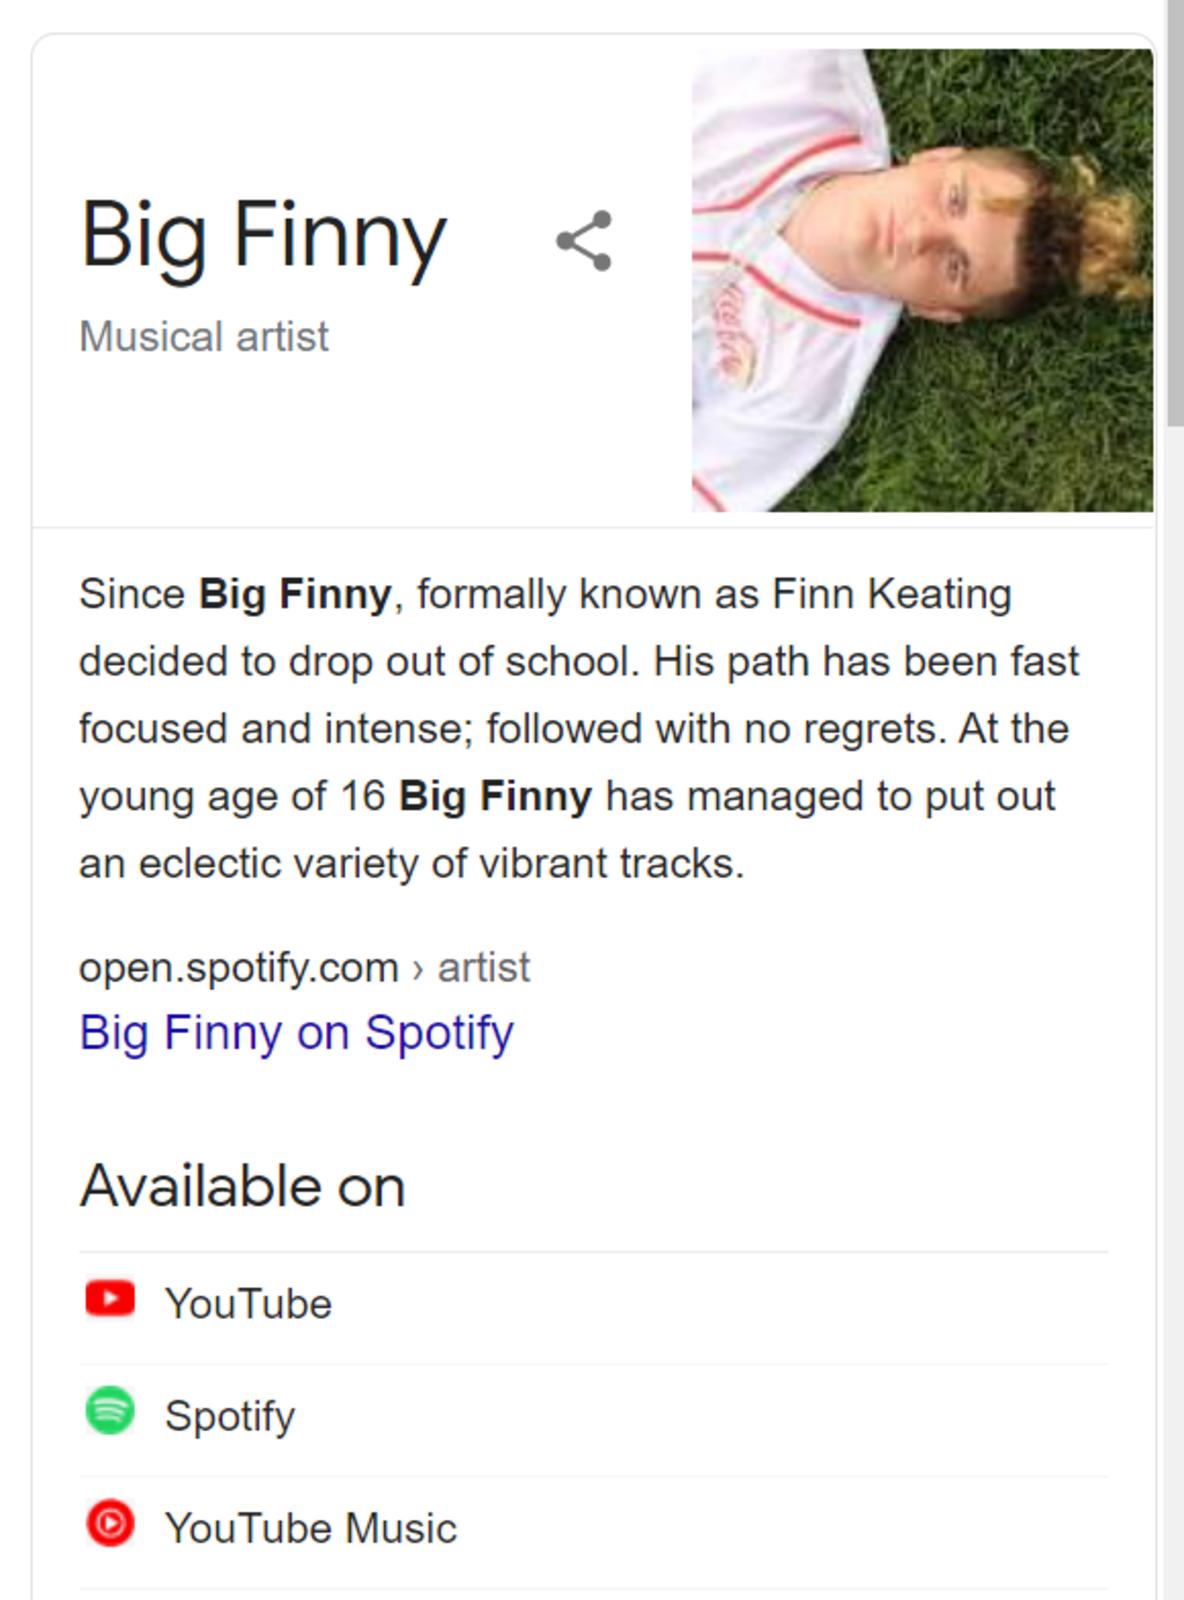 Big Finny